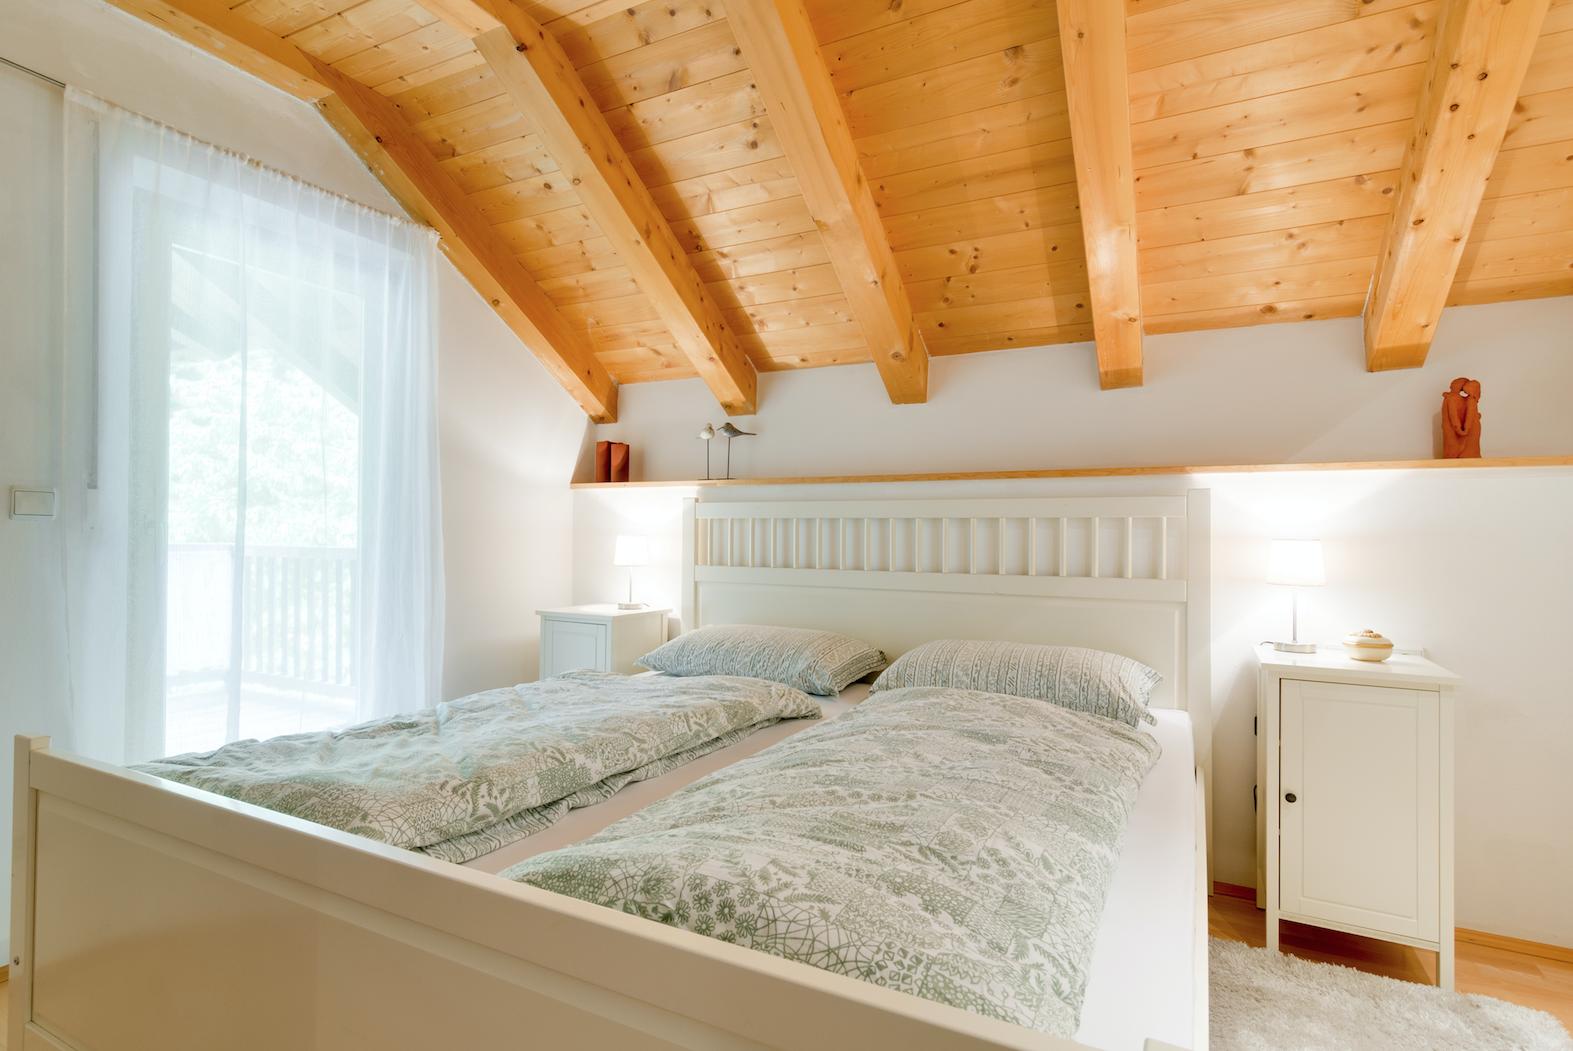 Schlafzimmer Mansarde Hafling